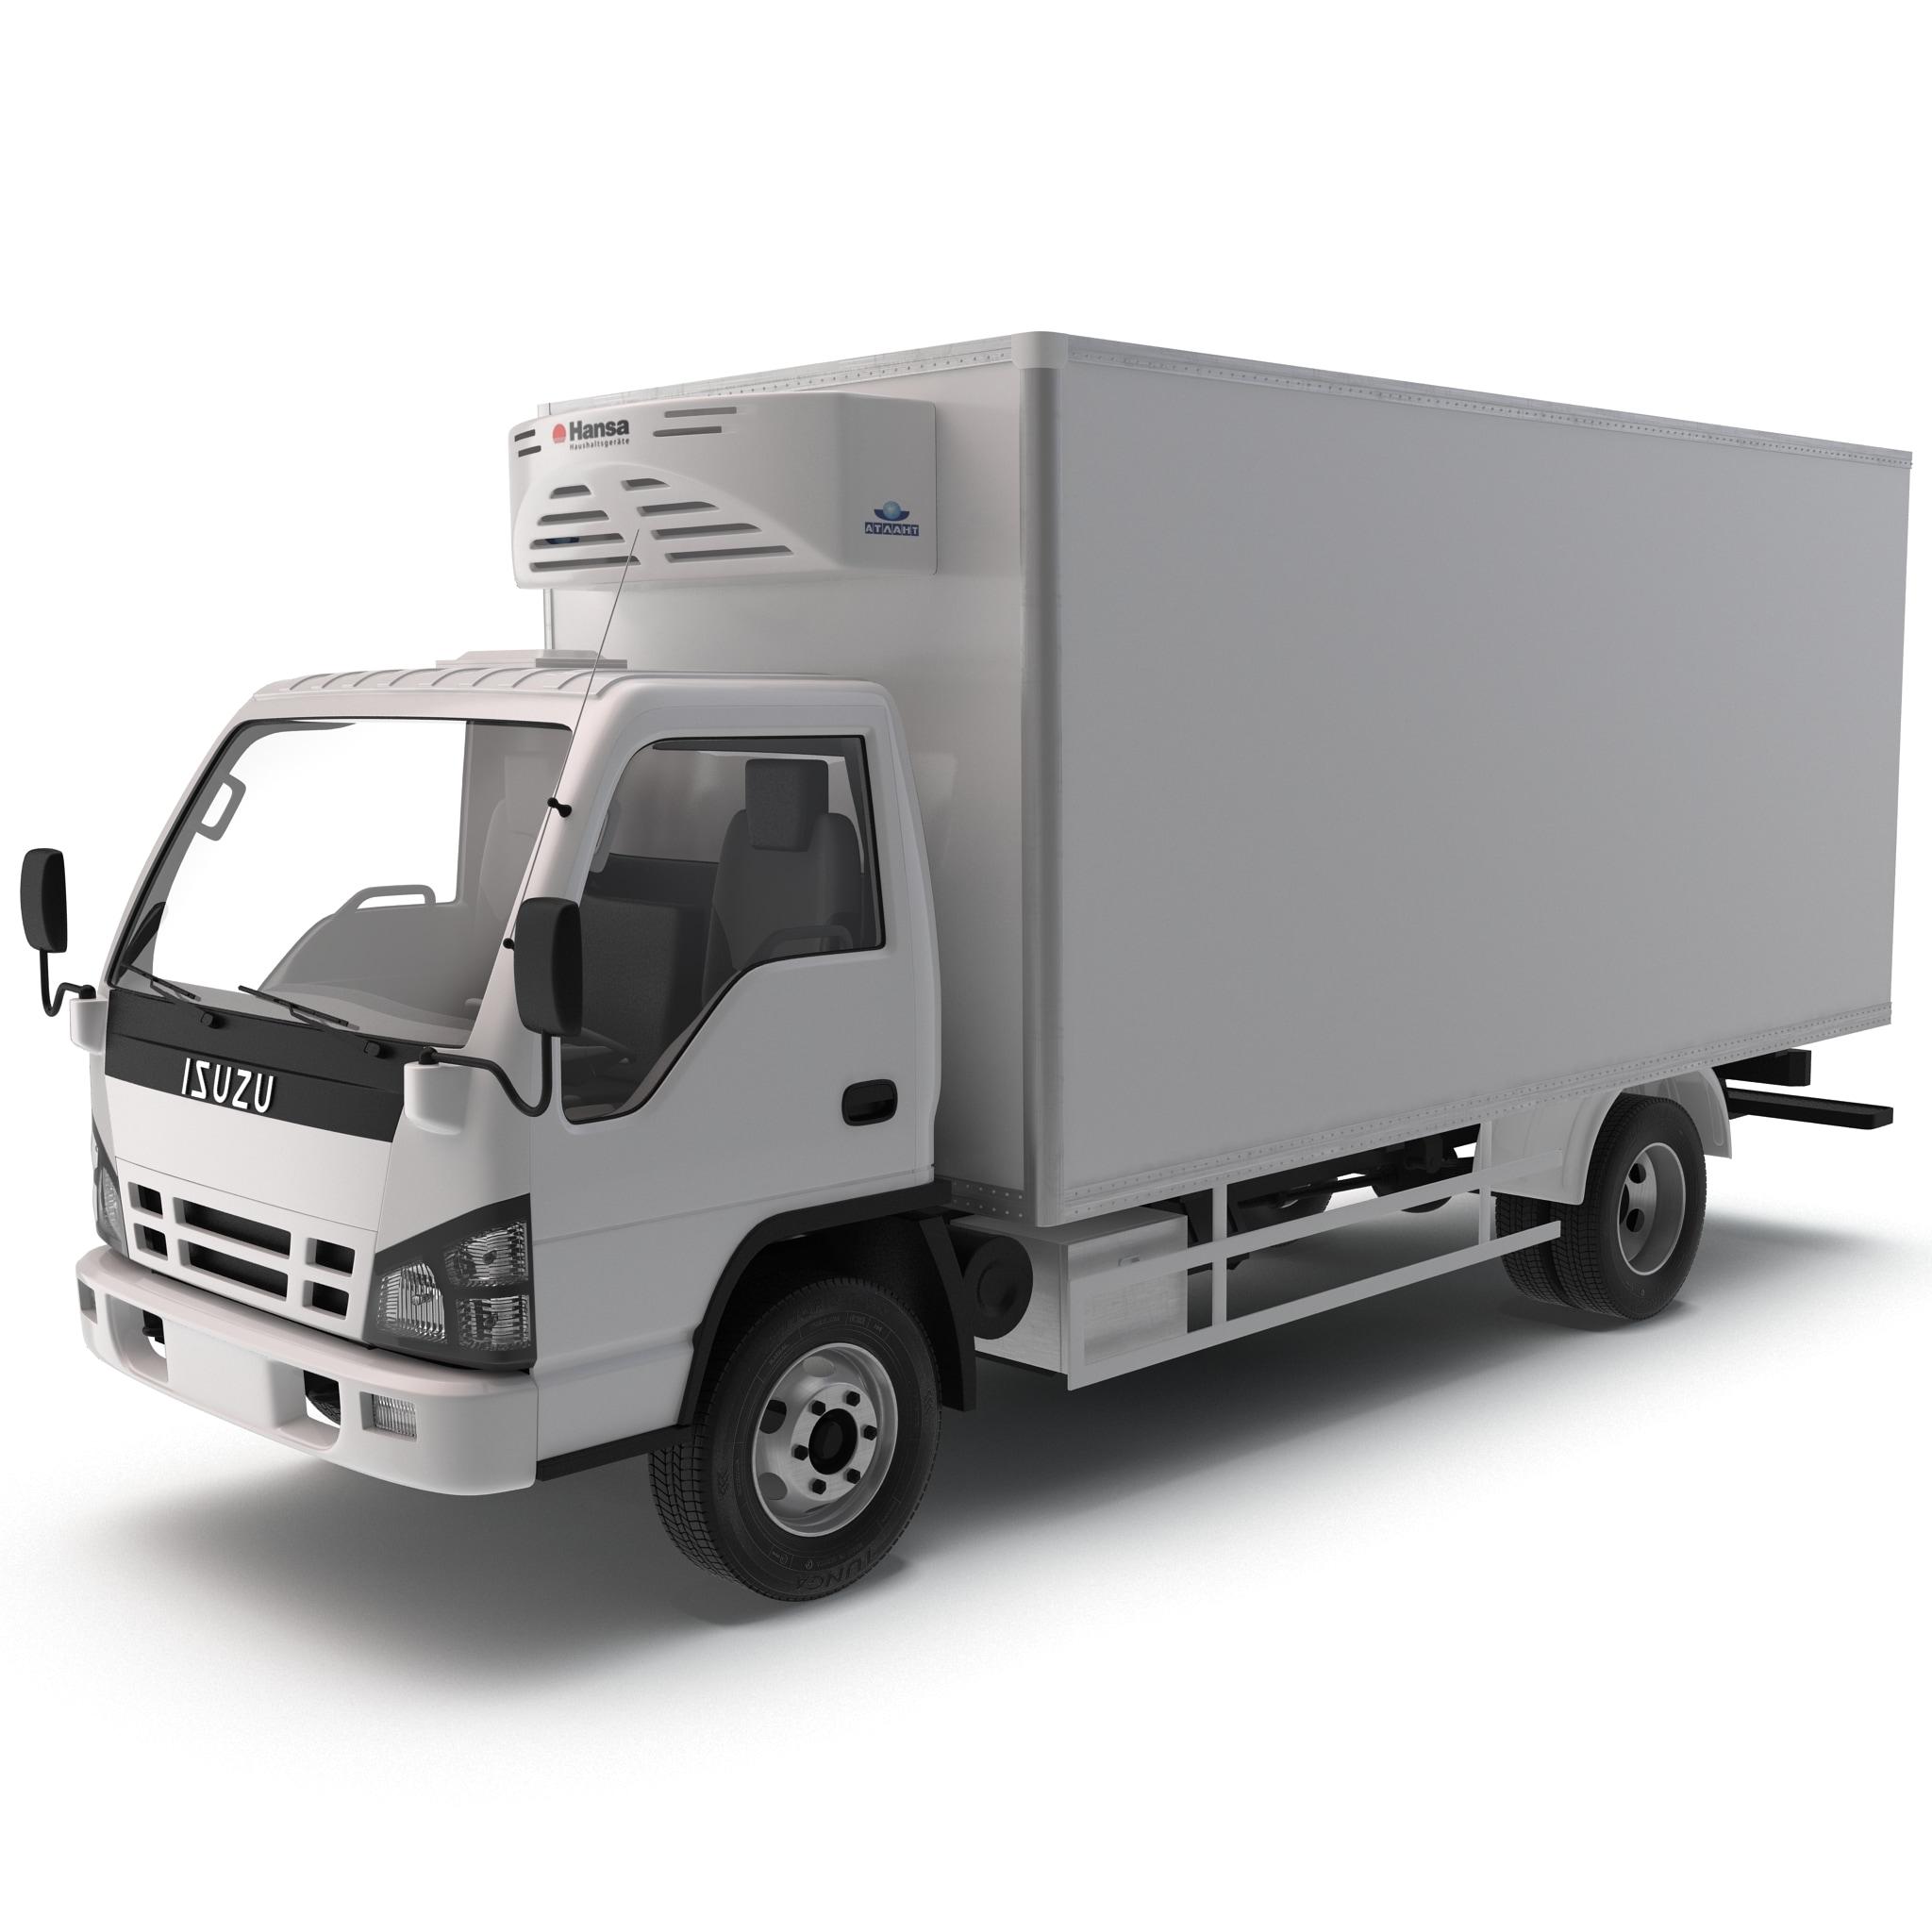 3ds max refrigerator truck isuzu npr. Black Bedroom Furniture Sets. Home Design Ideas